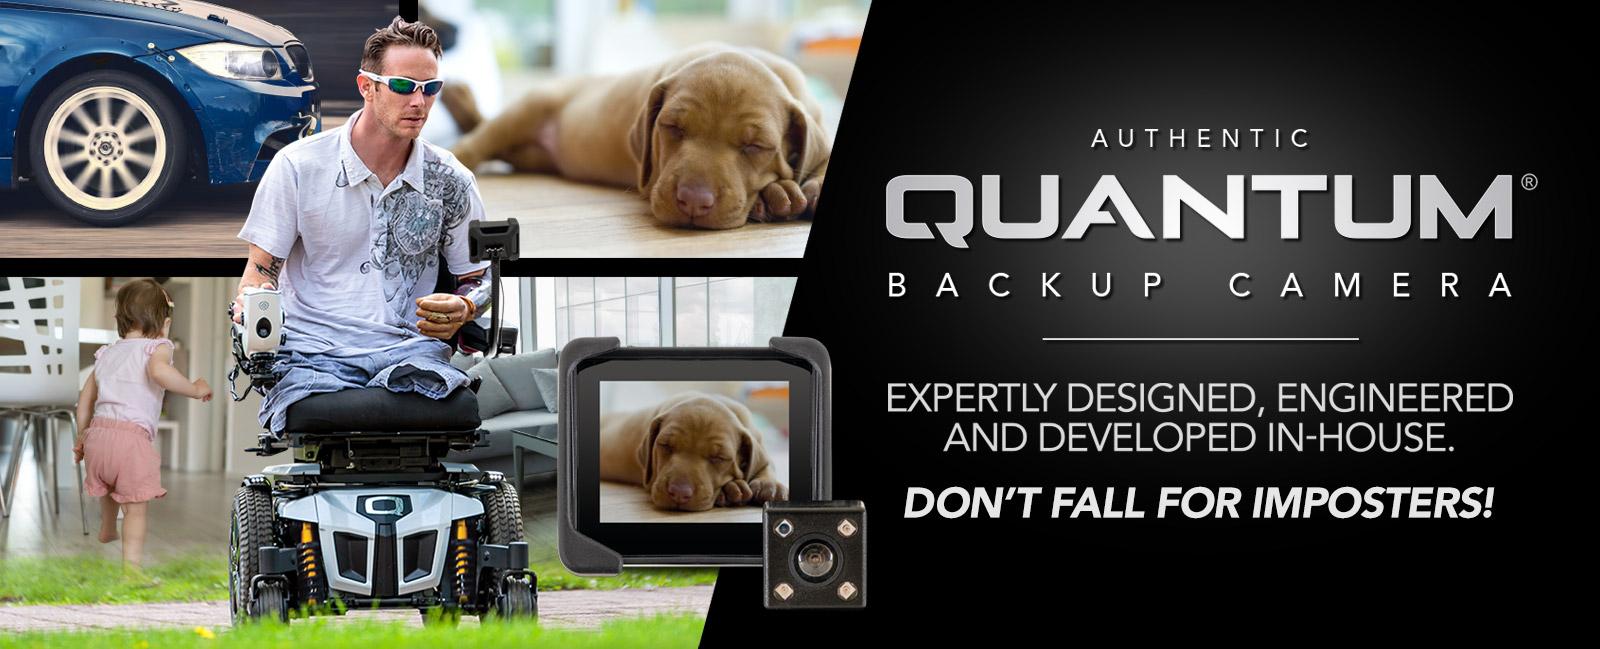 Quantum Backup Camera